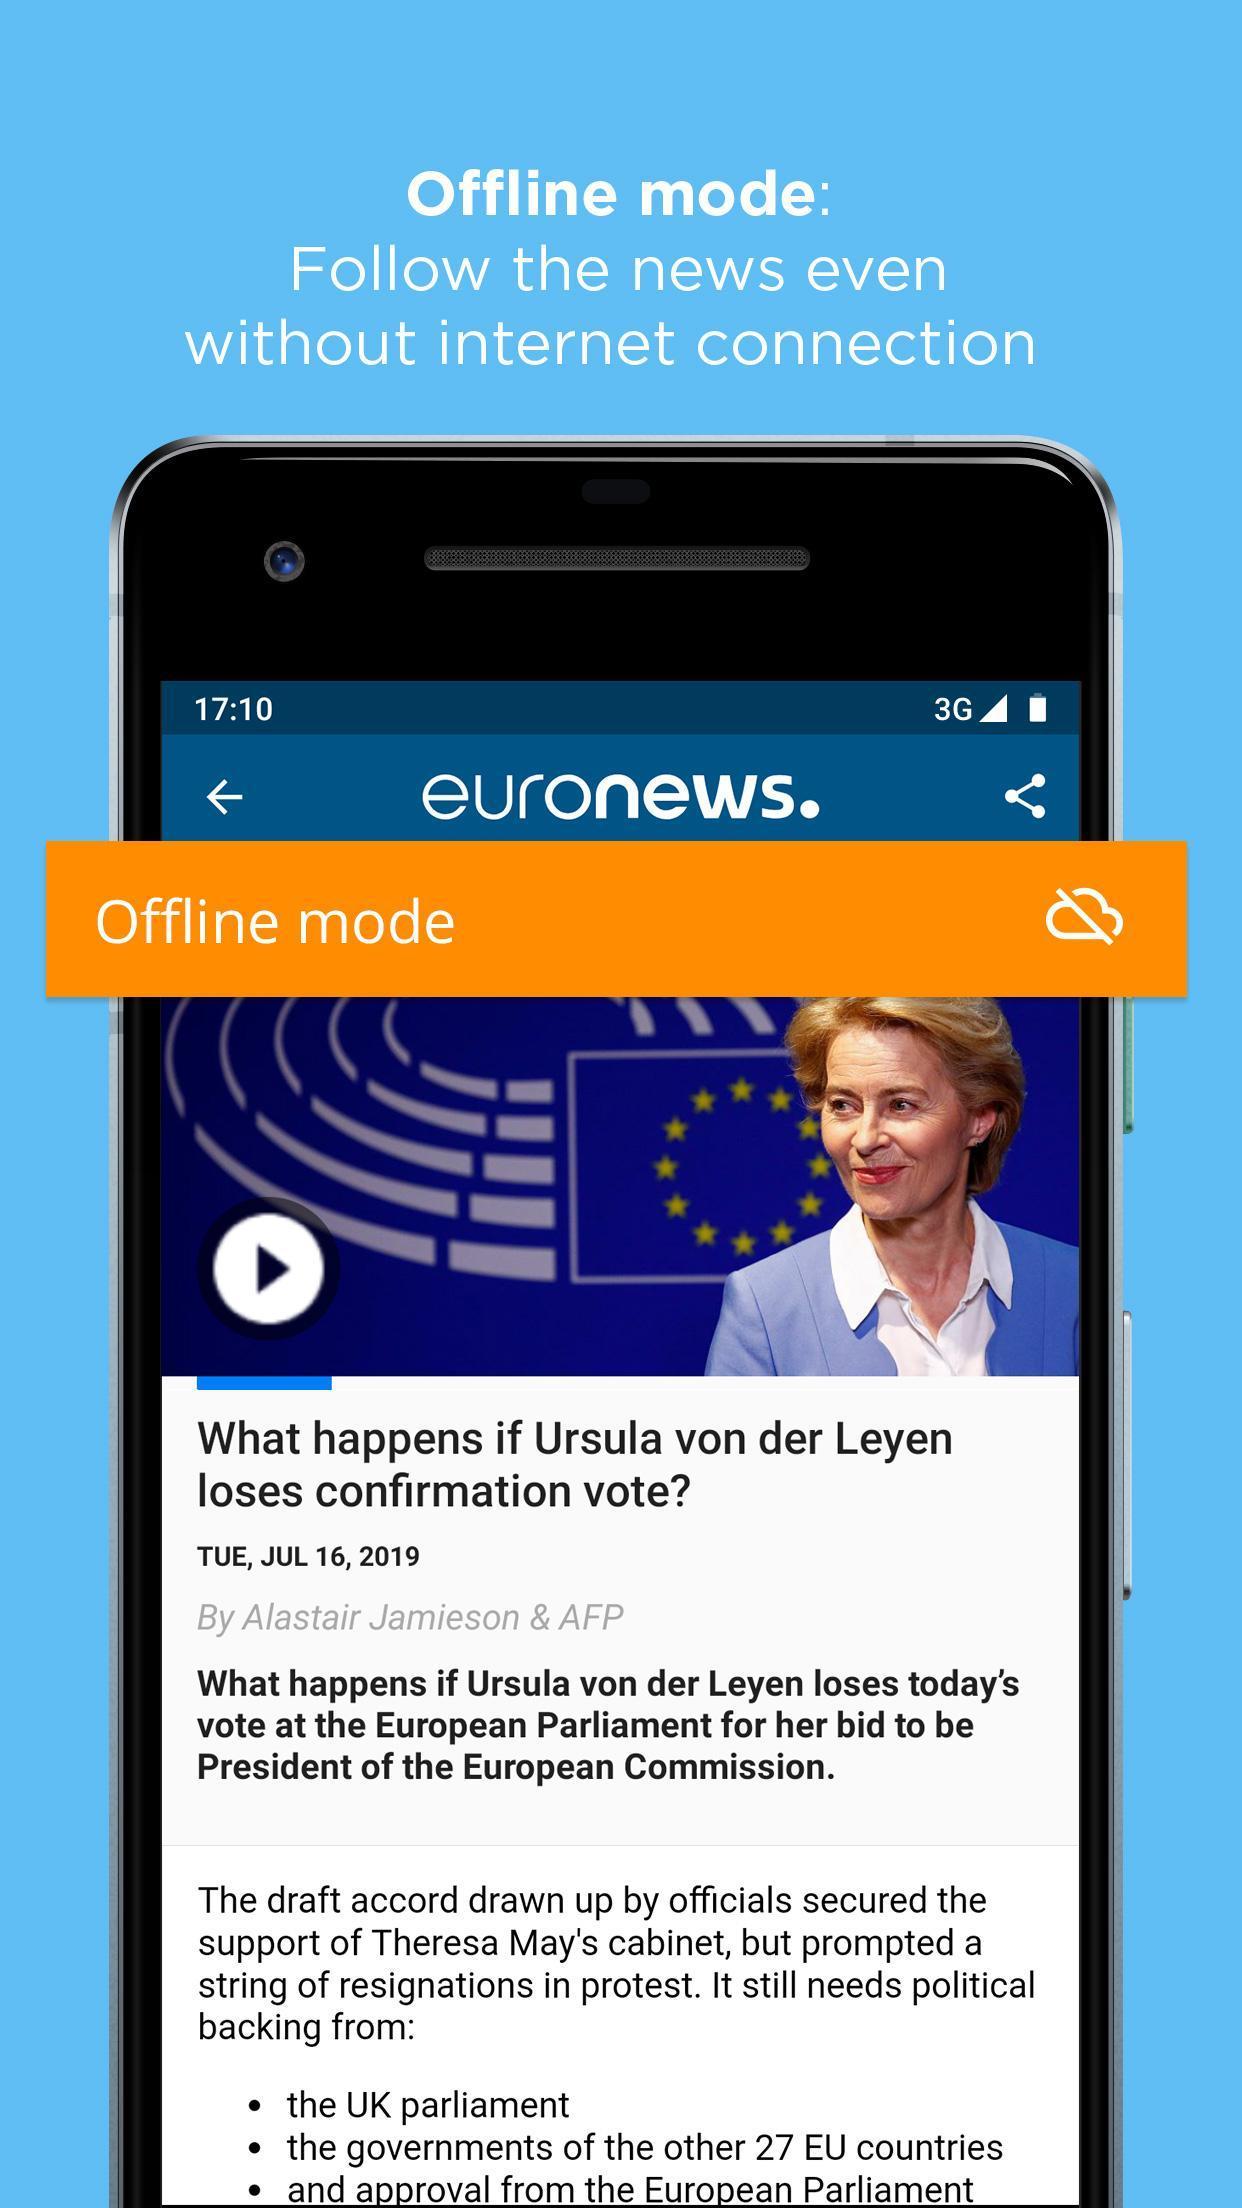 Euronews Daily breaking world news & Live TV 5.2.1 Screenshot 6